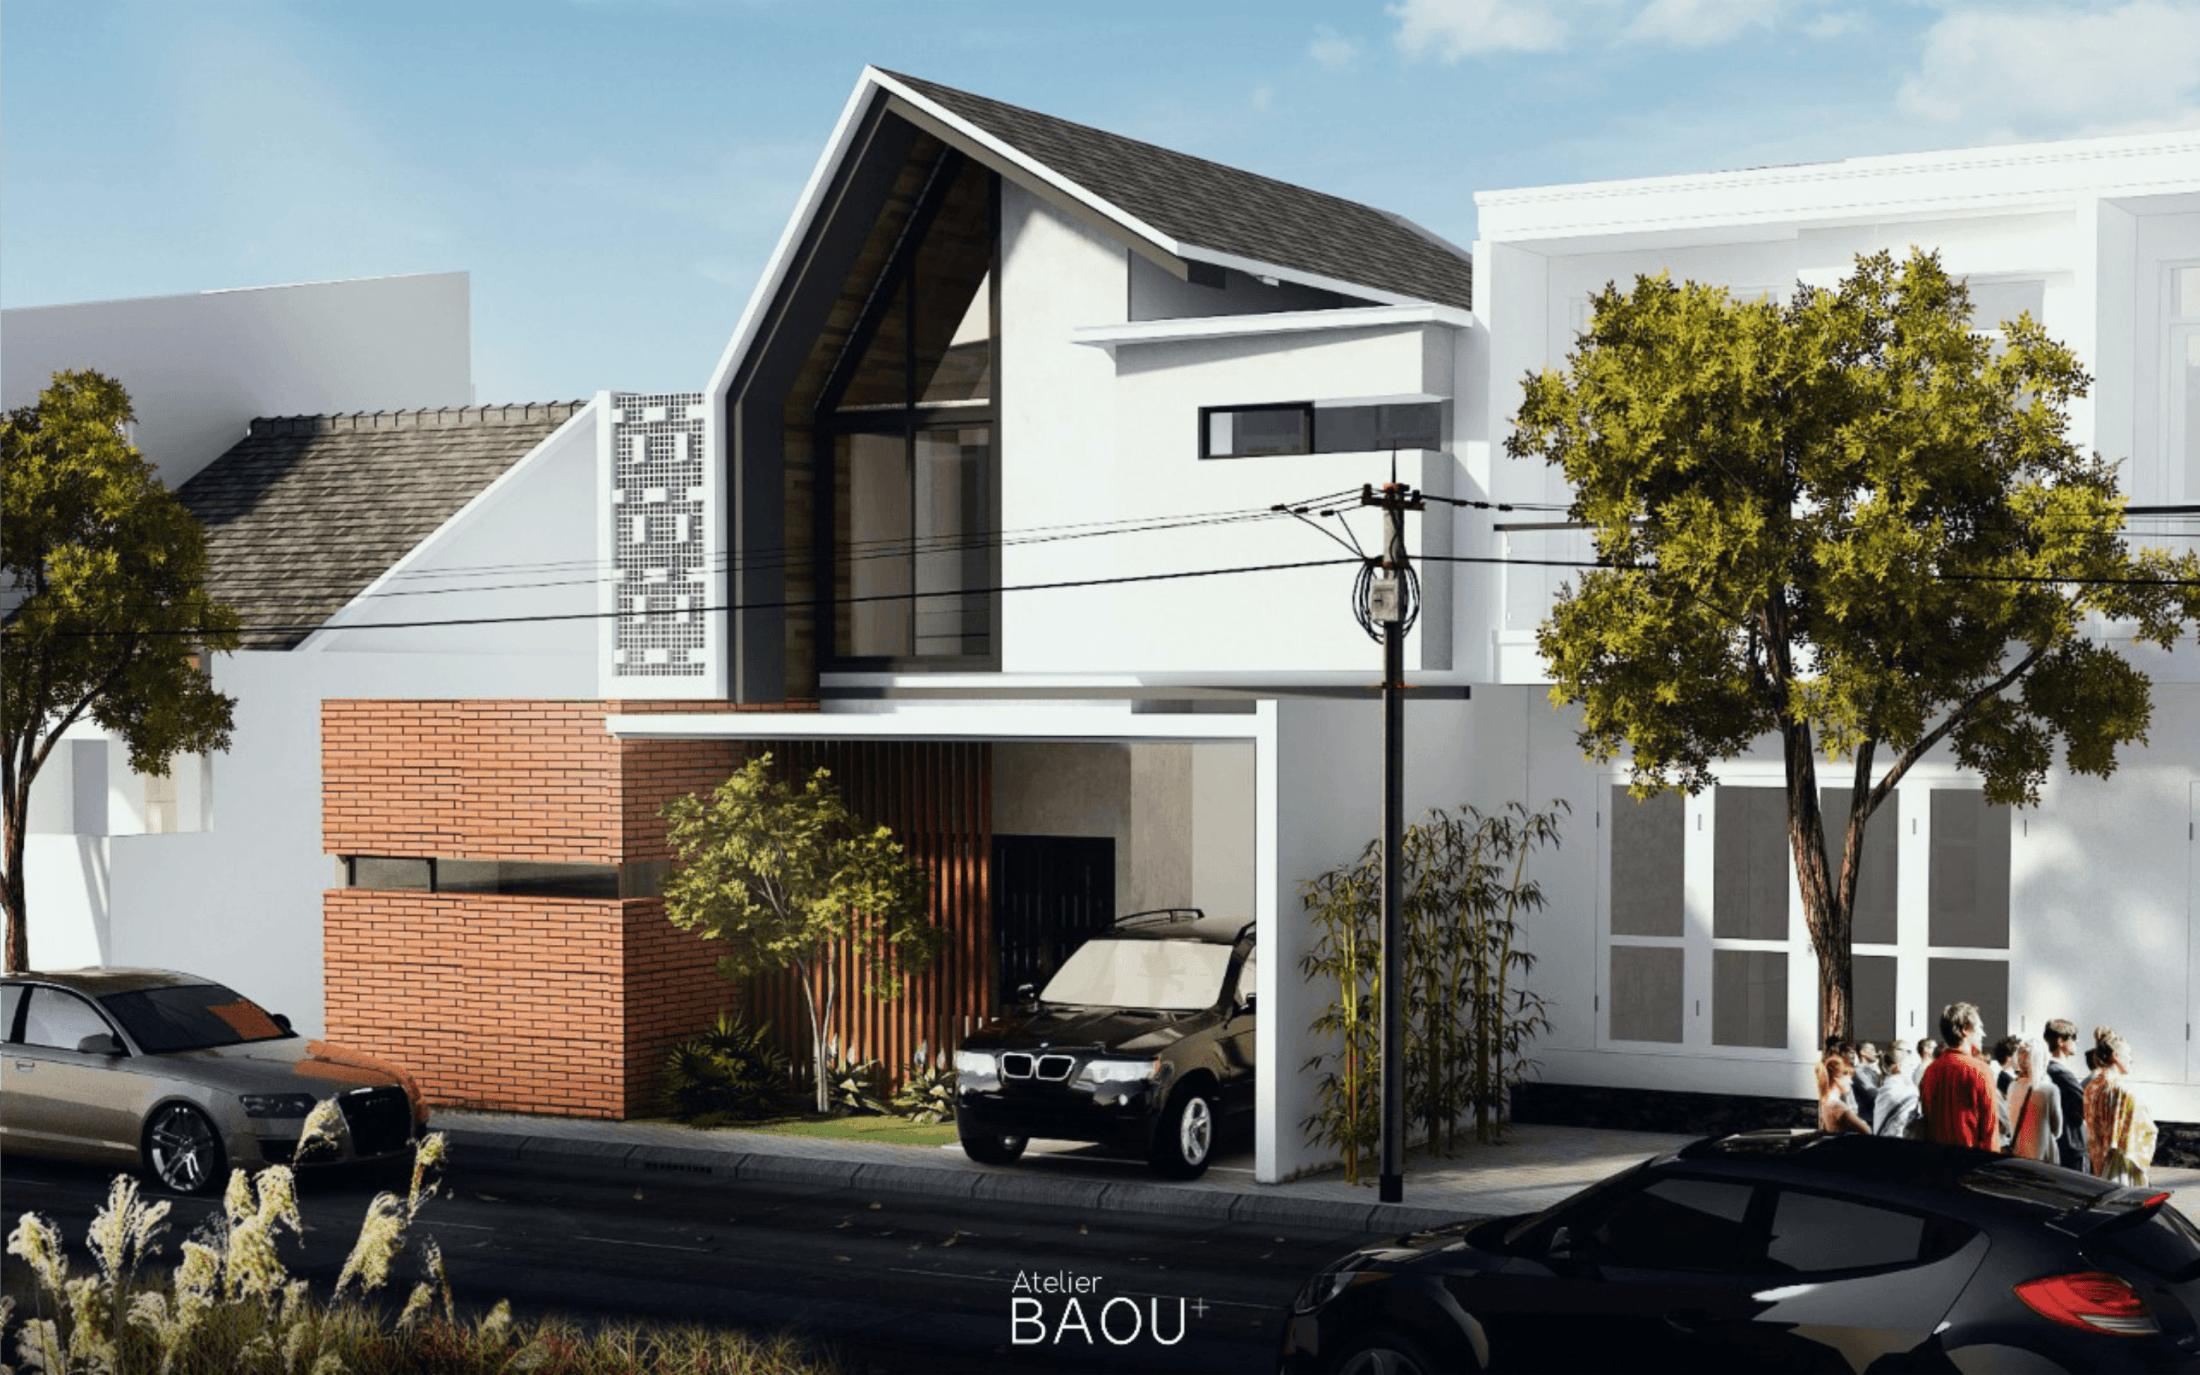 Atelier Baou Sr House Kec. Serpong, Kota Tangerang Selatan, Banten, Indonesia Kec. Serpong, Kota Tangerang Selatan, Banten, Indonesia Atelier-Baou-Sr-House  86440